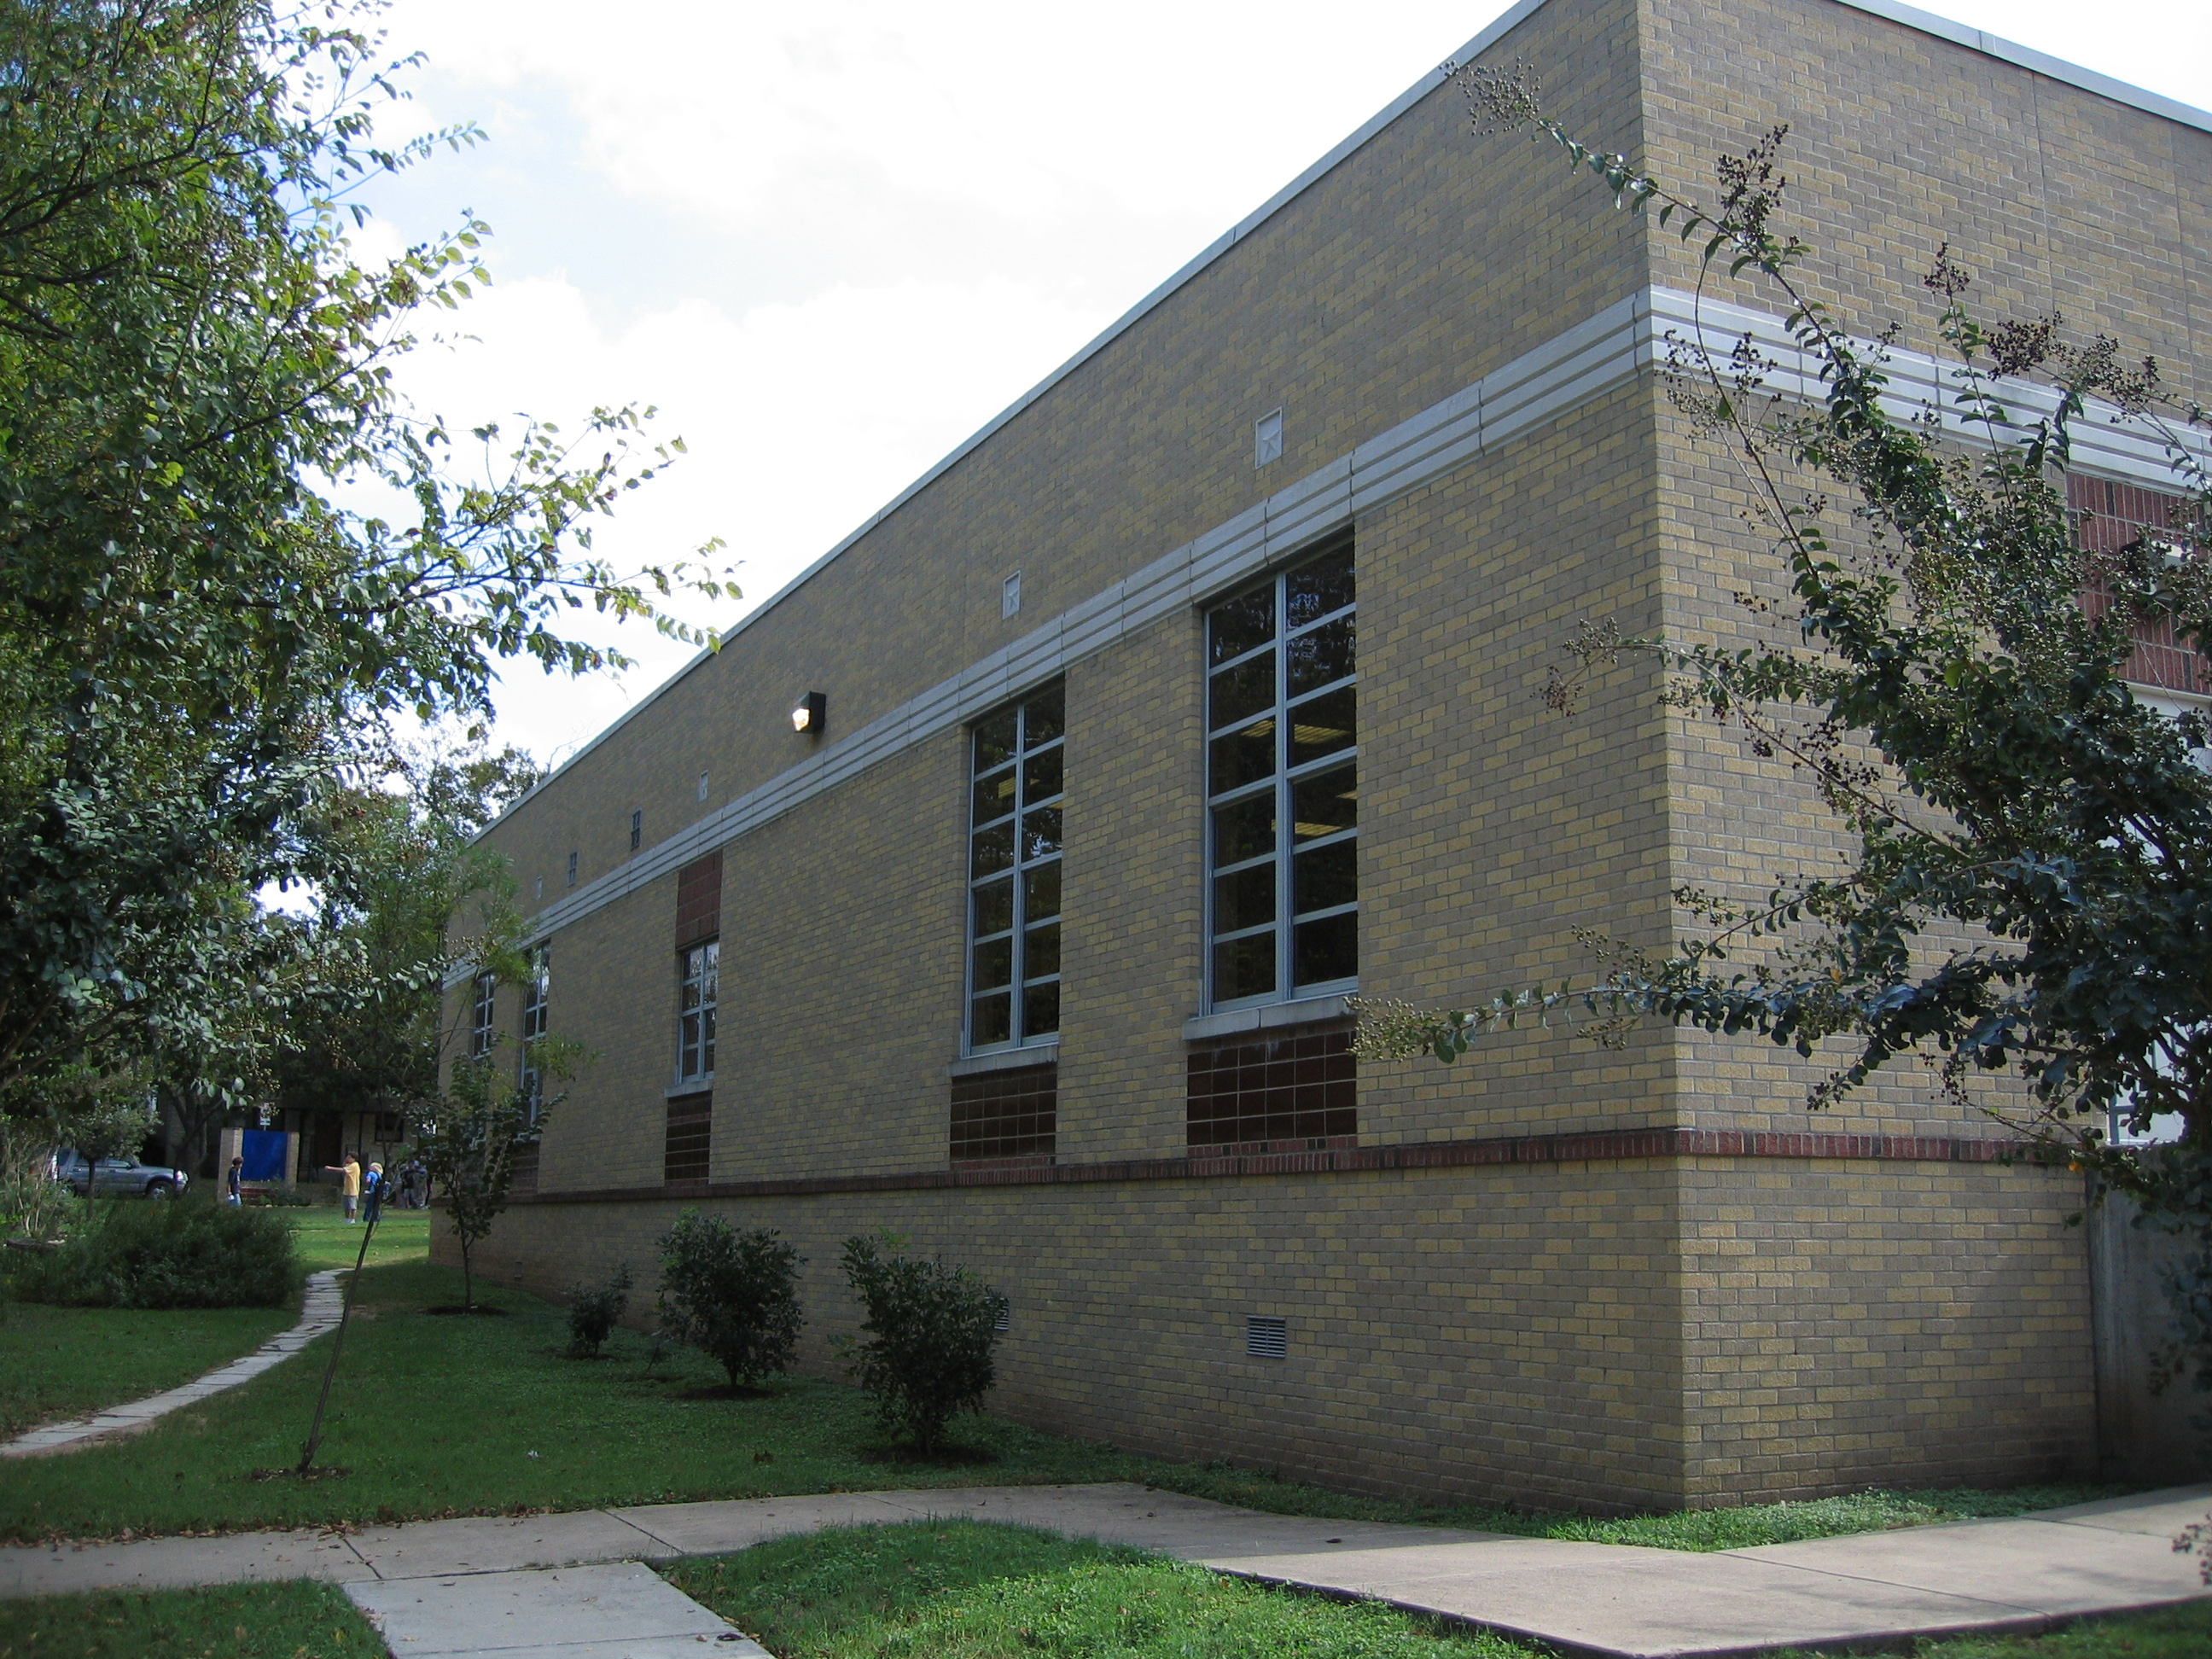 Lee Elementary - New Gymnasium